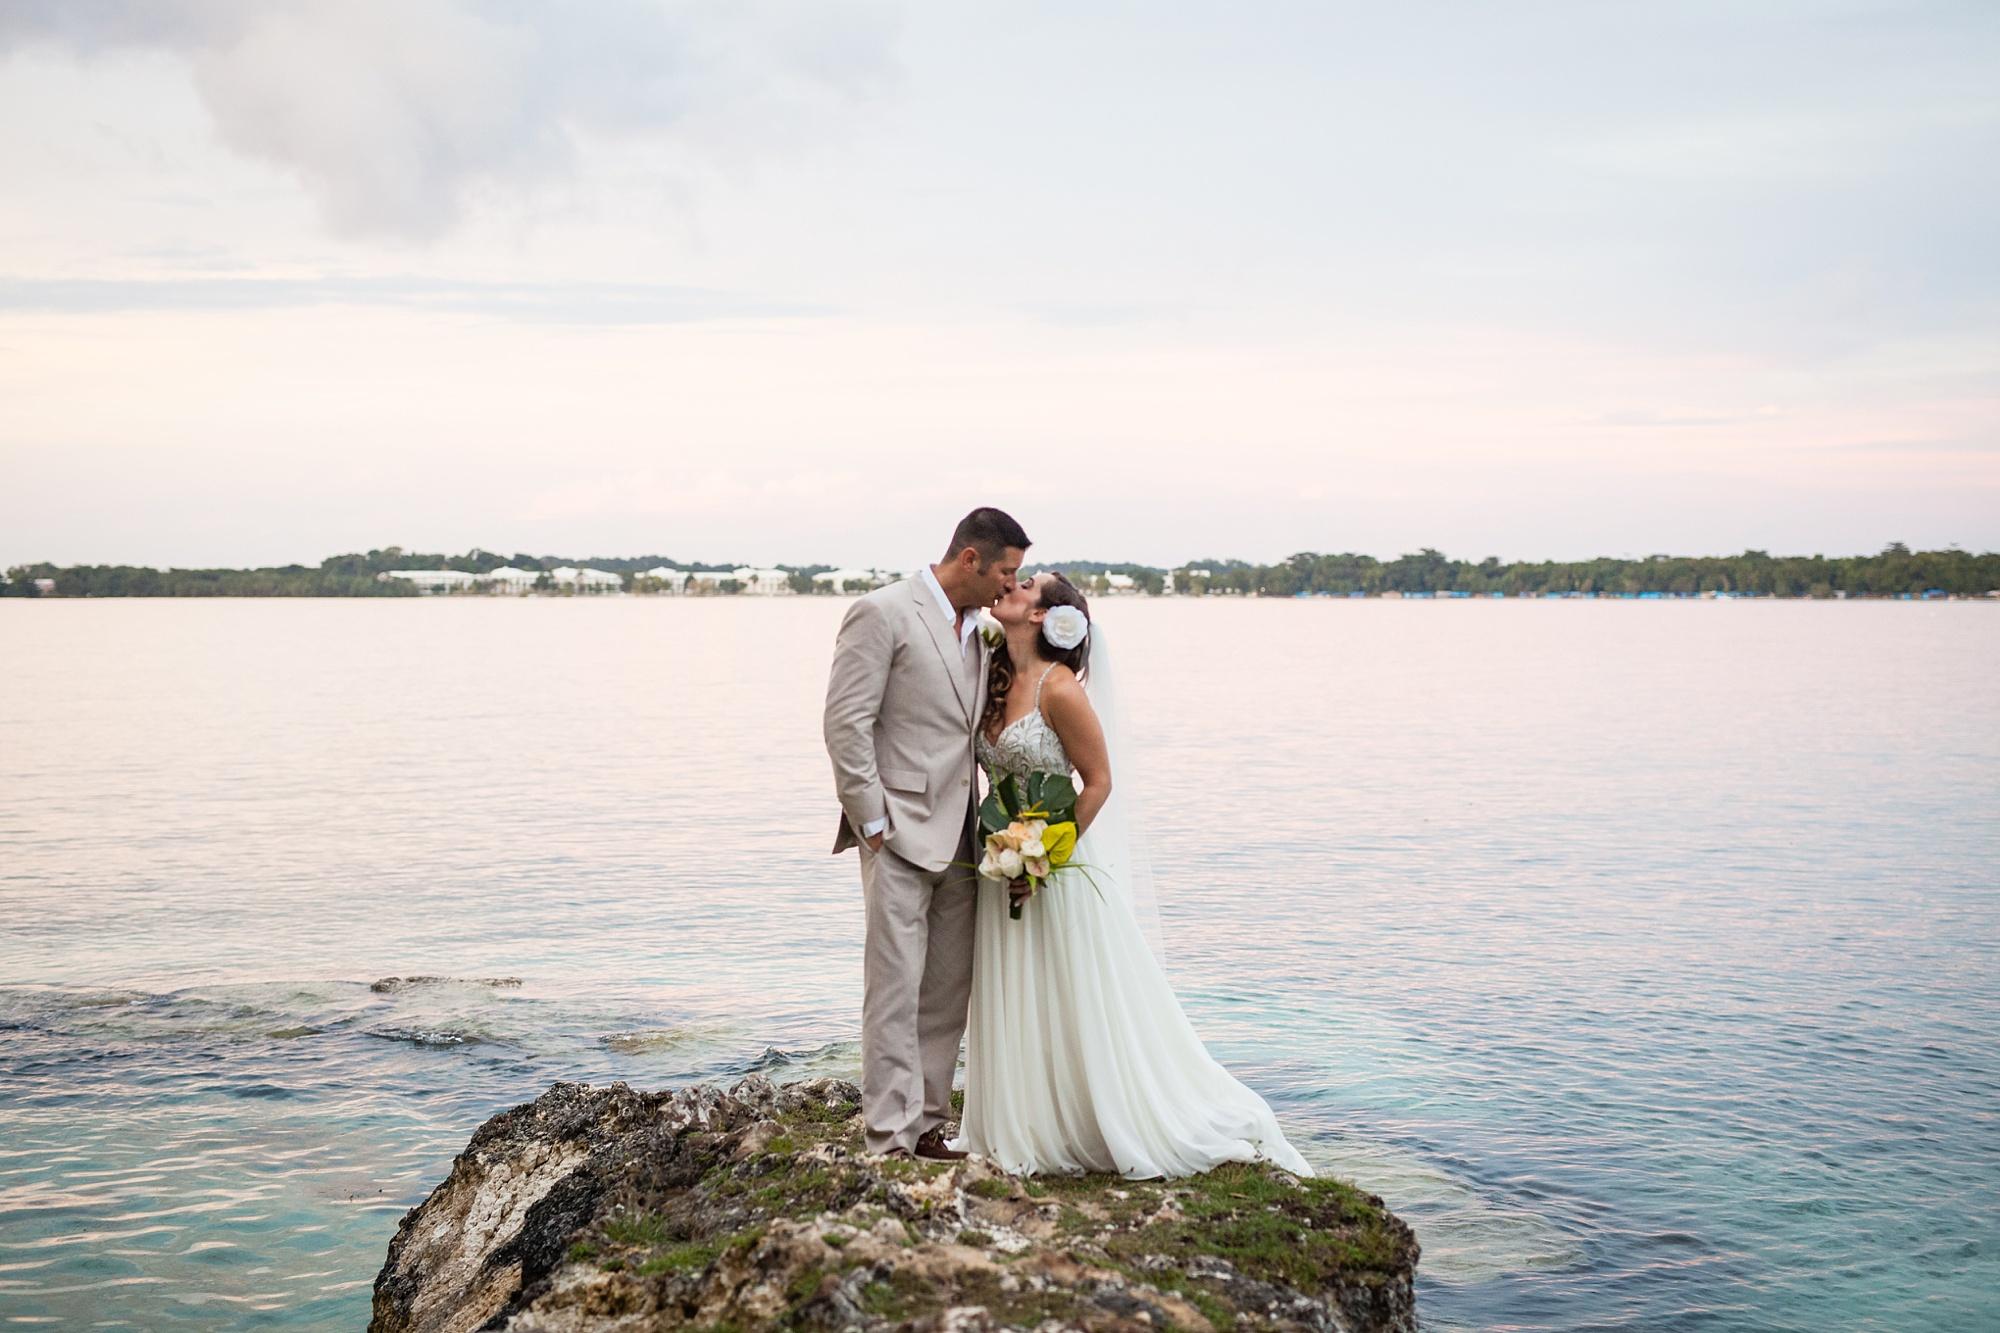 Brandon_Shafer_Photography_Scott_Marisa_Negril_Jamaica_Destination_Wedding_Photography_0051.jpg